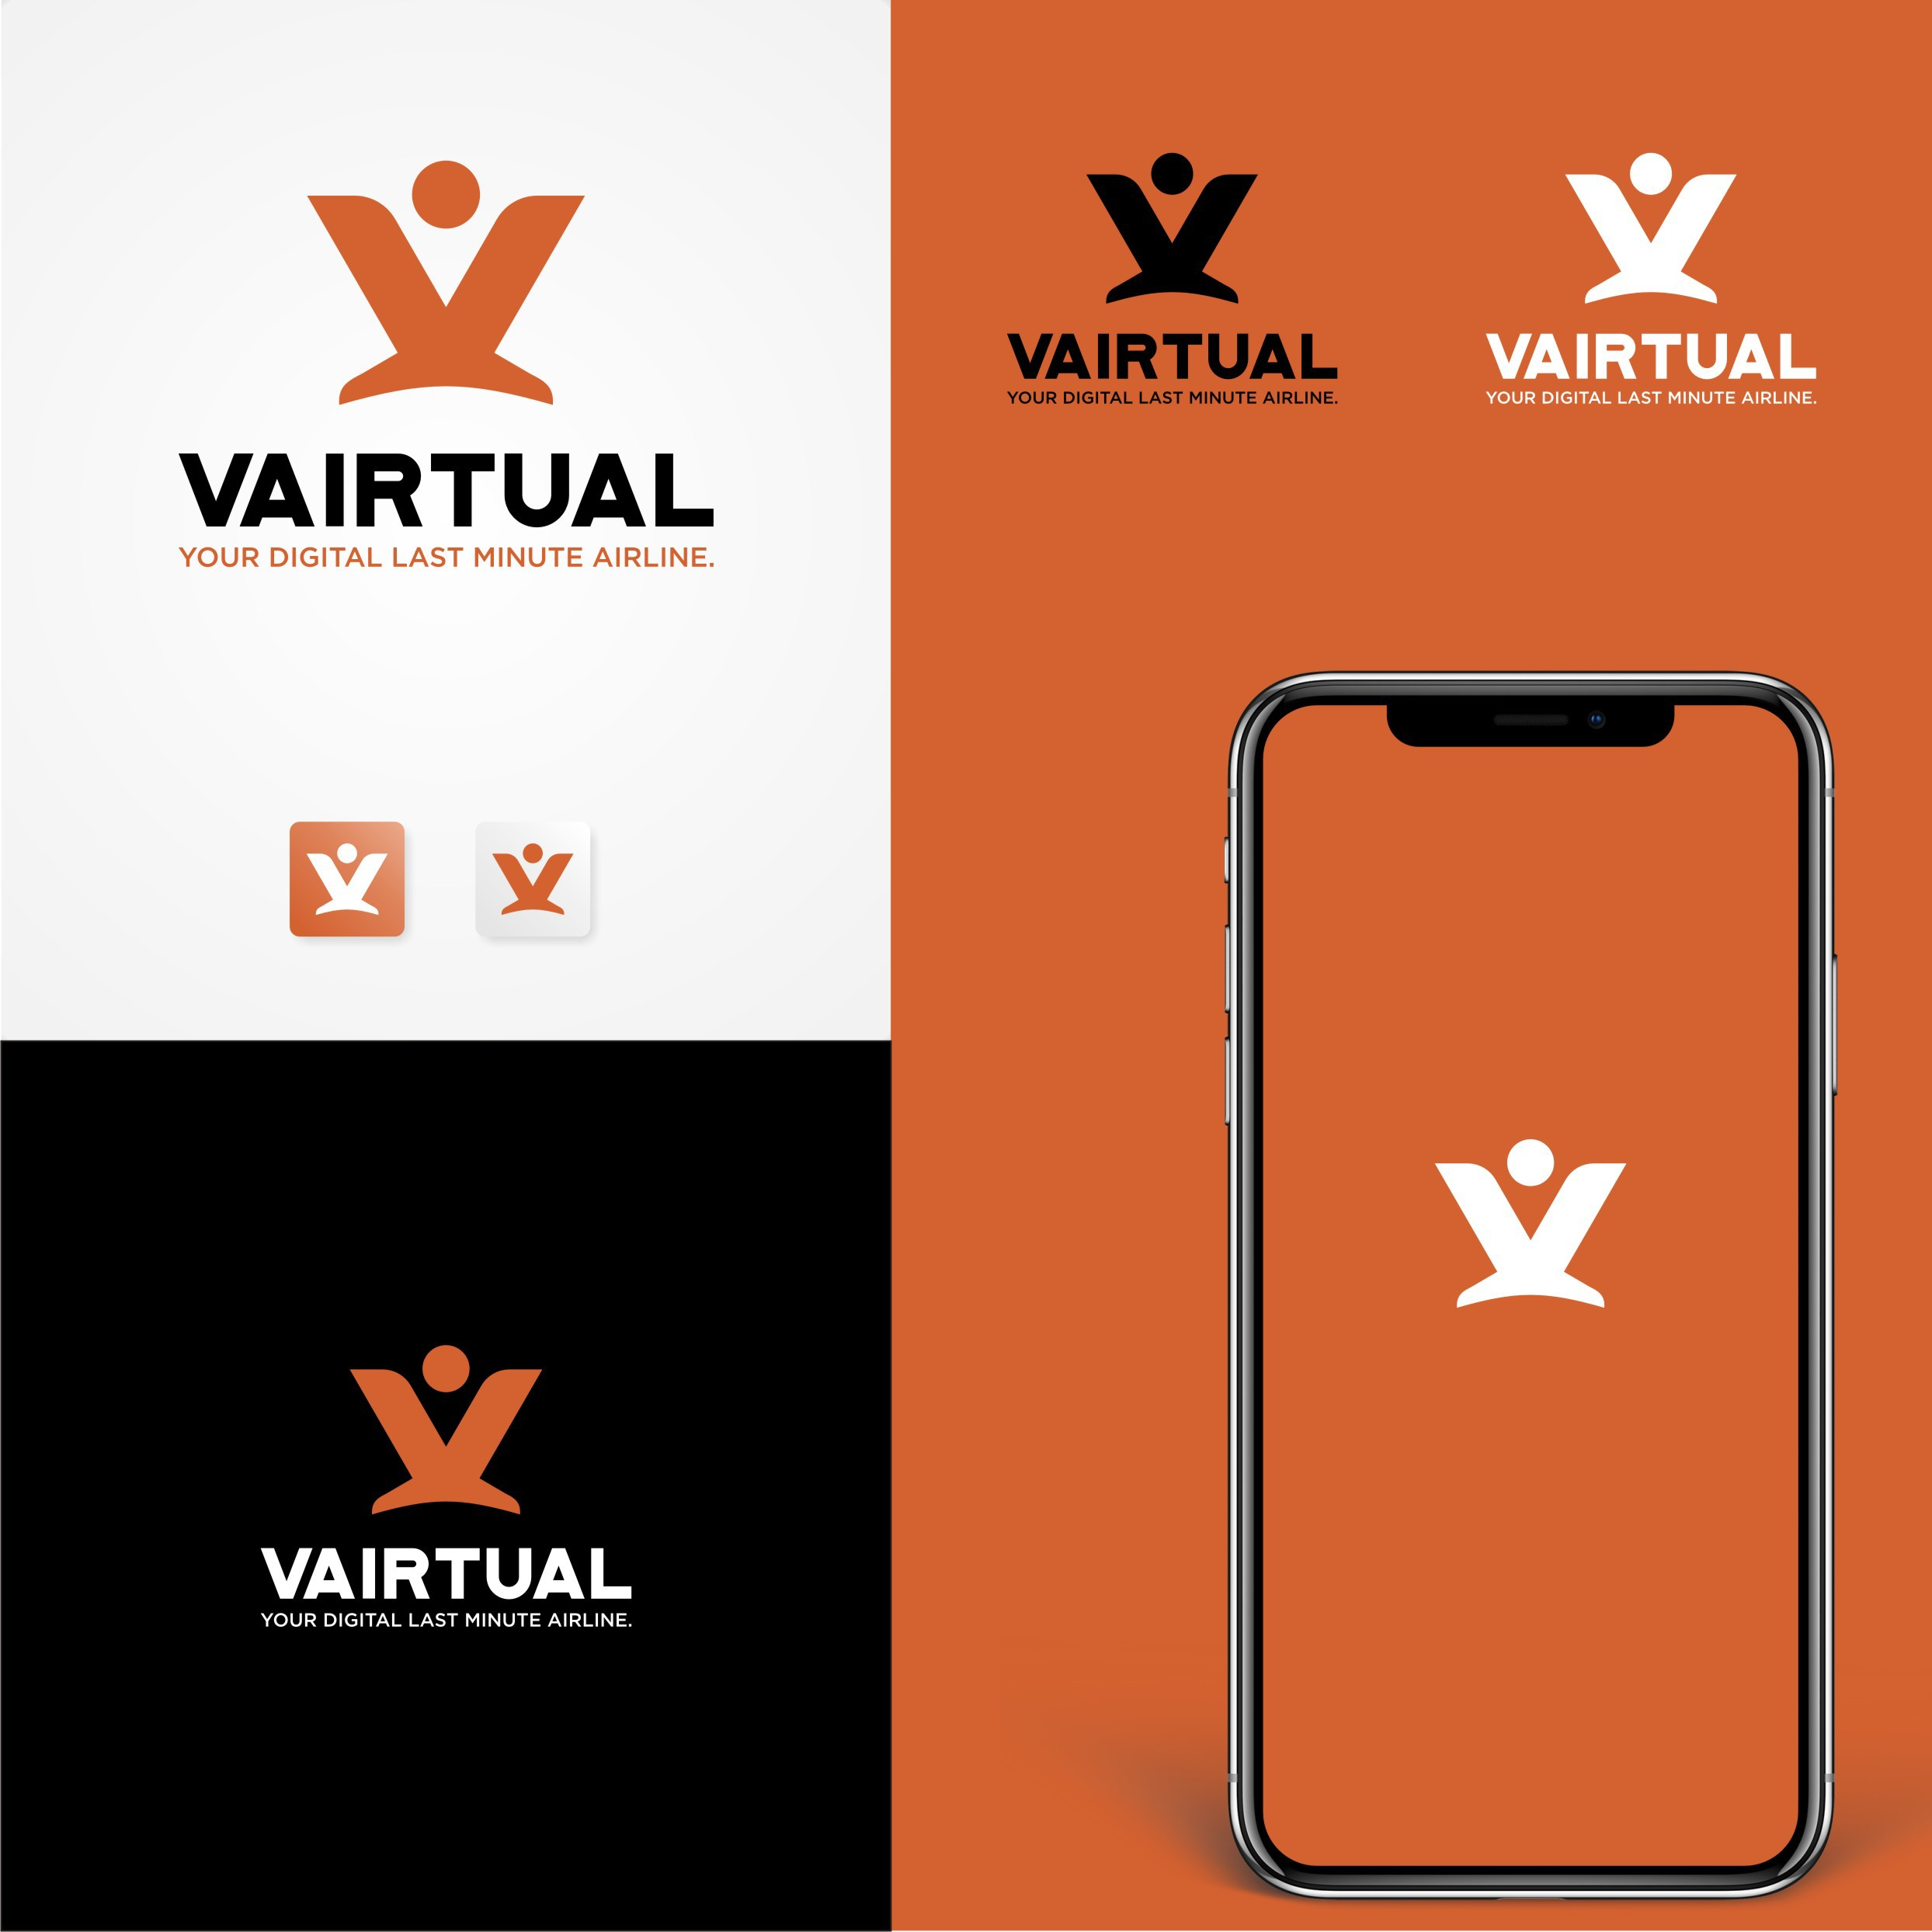 Vairtual - Your digital last minute airline.